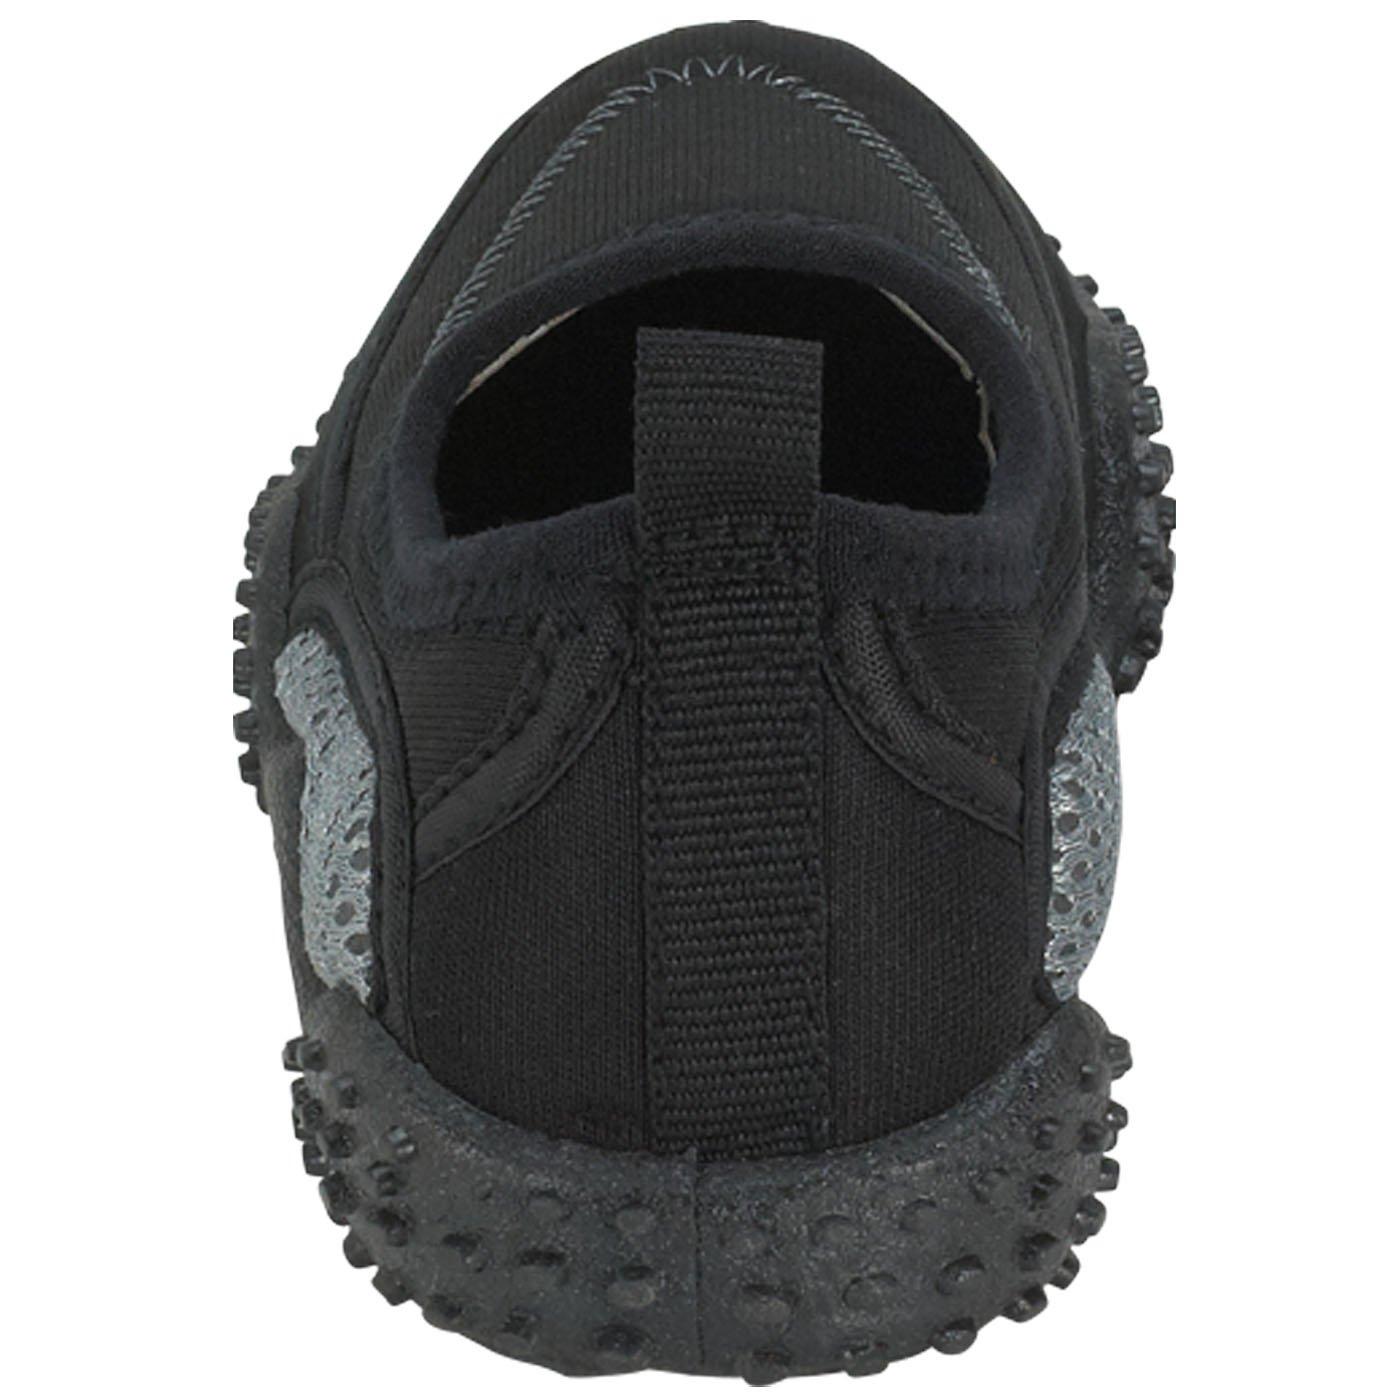 ea2d95a6f643f Airwalk Boys' Toddler Water Sock